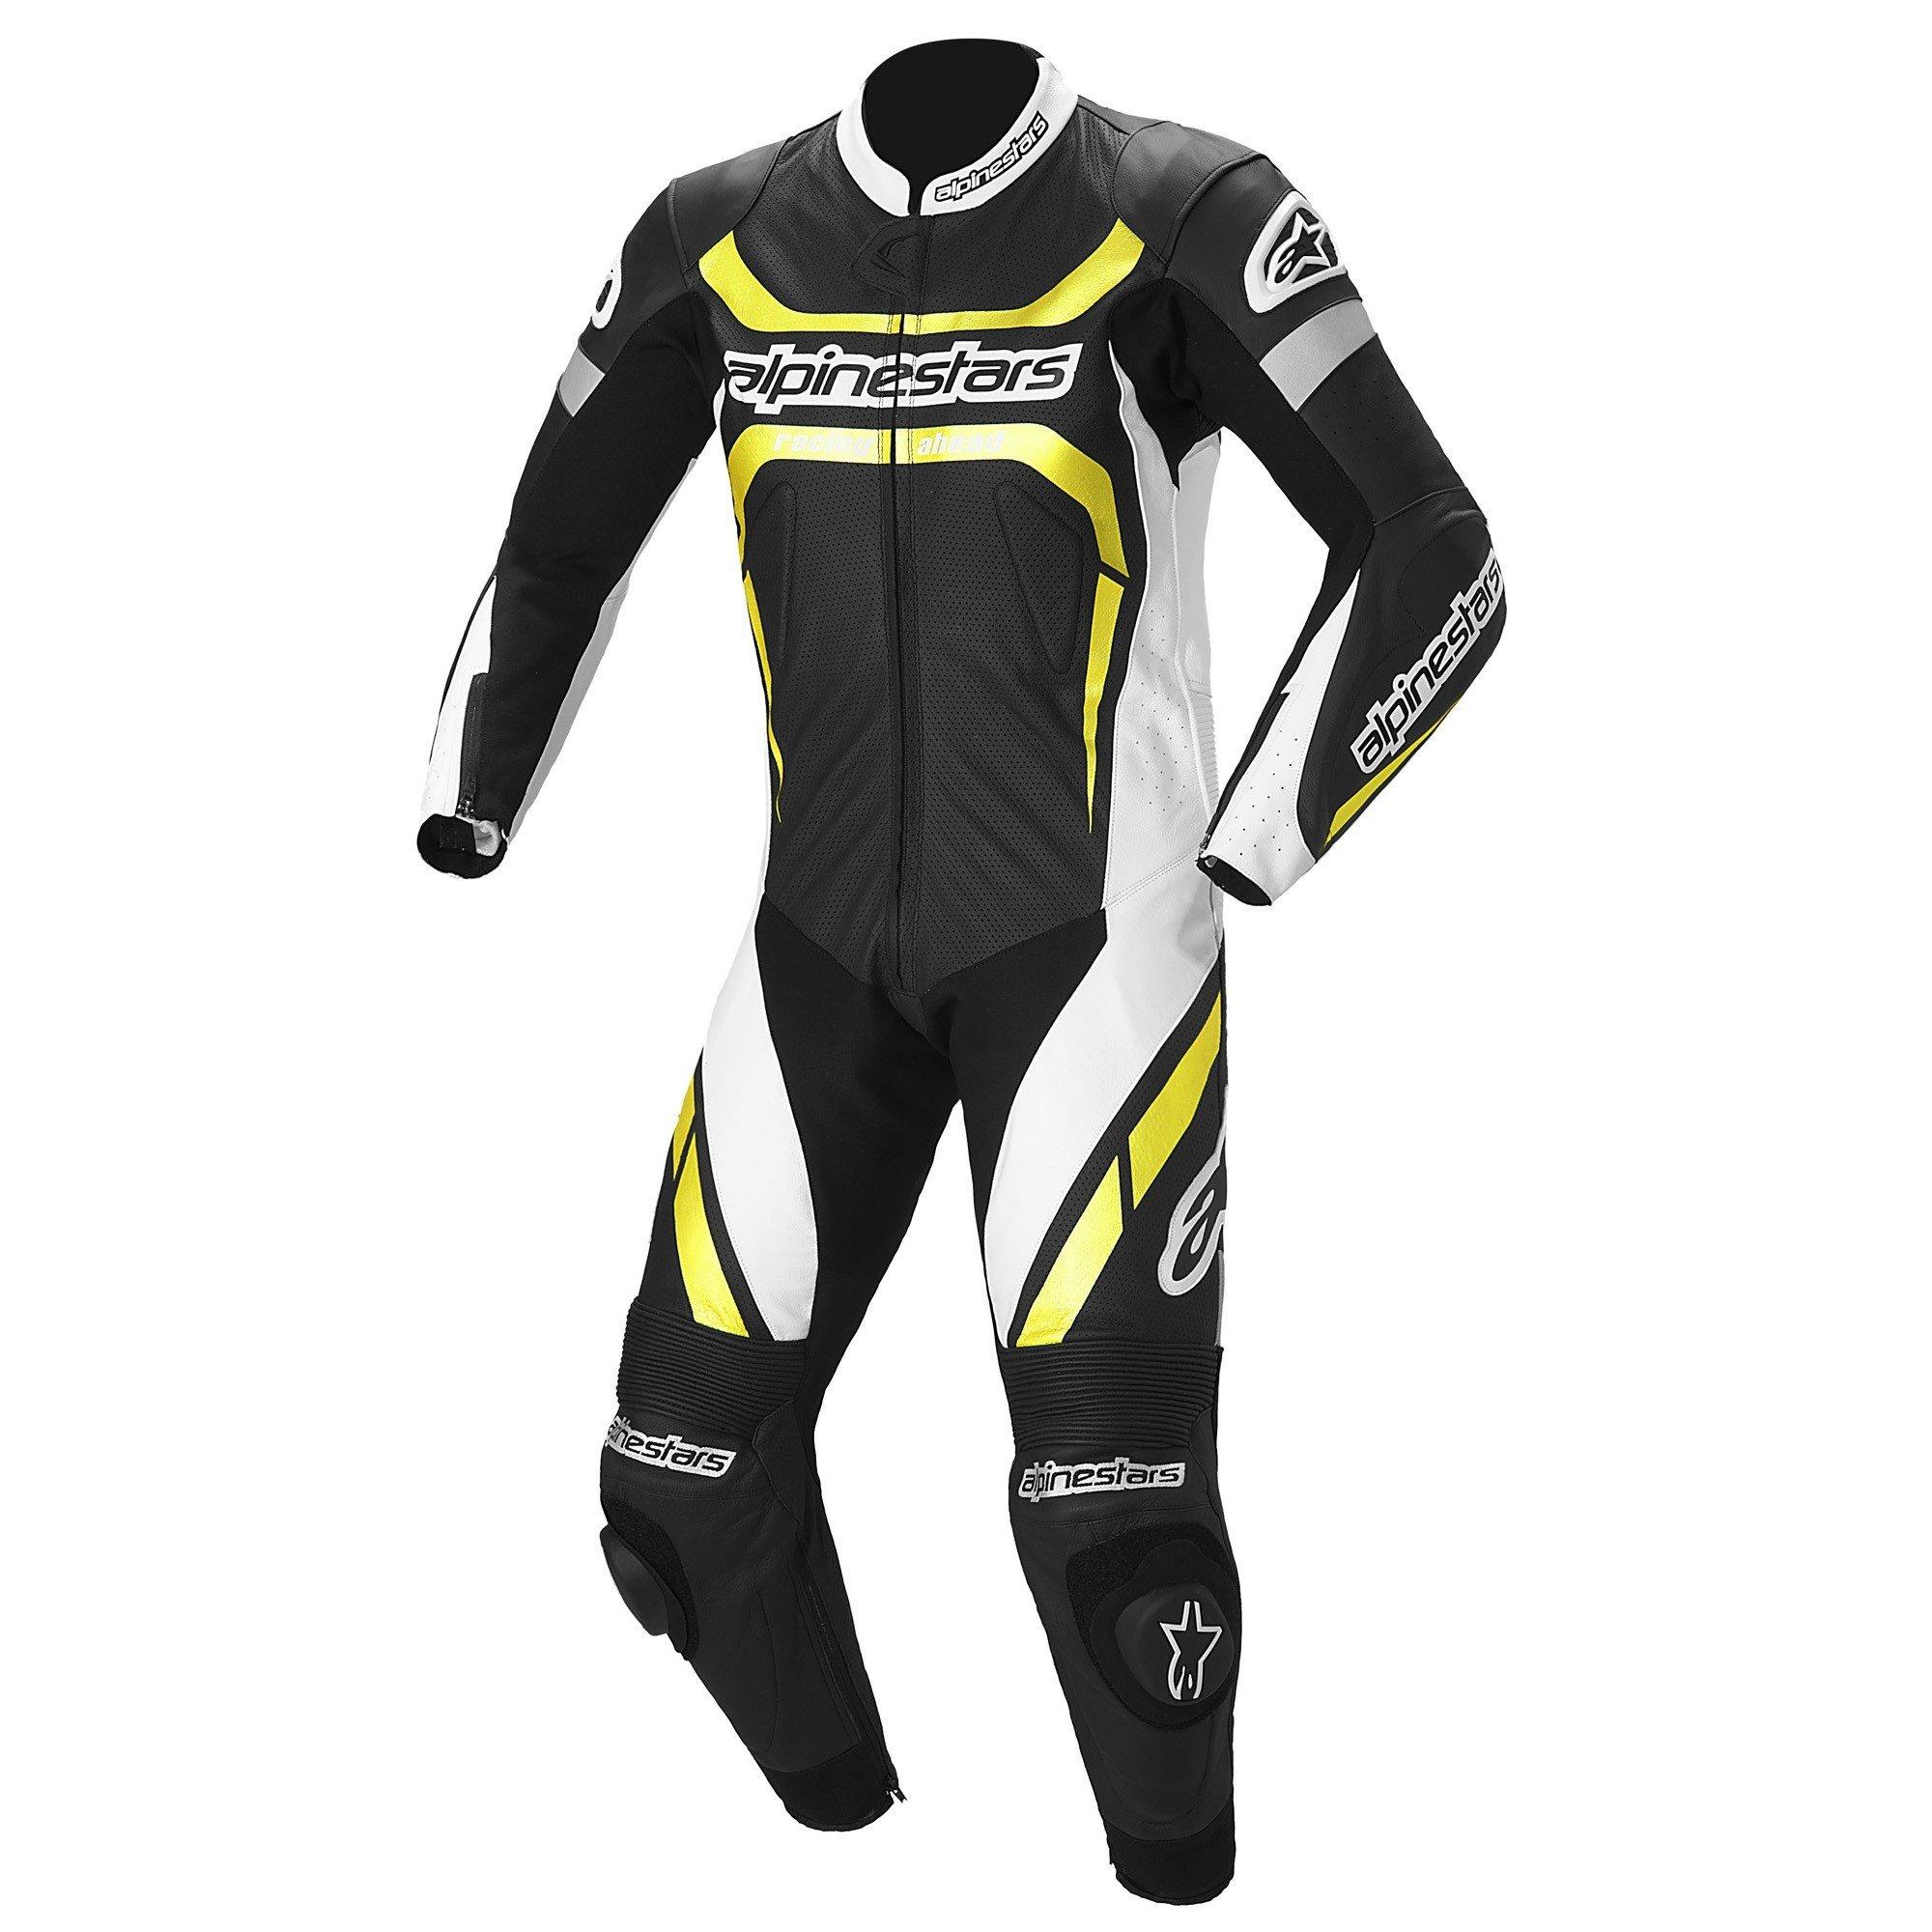 Alpinestars Motegi 1PC Black/White/Yellow 48